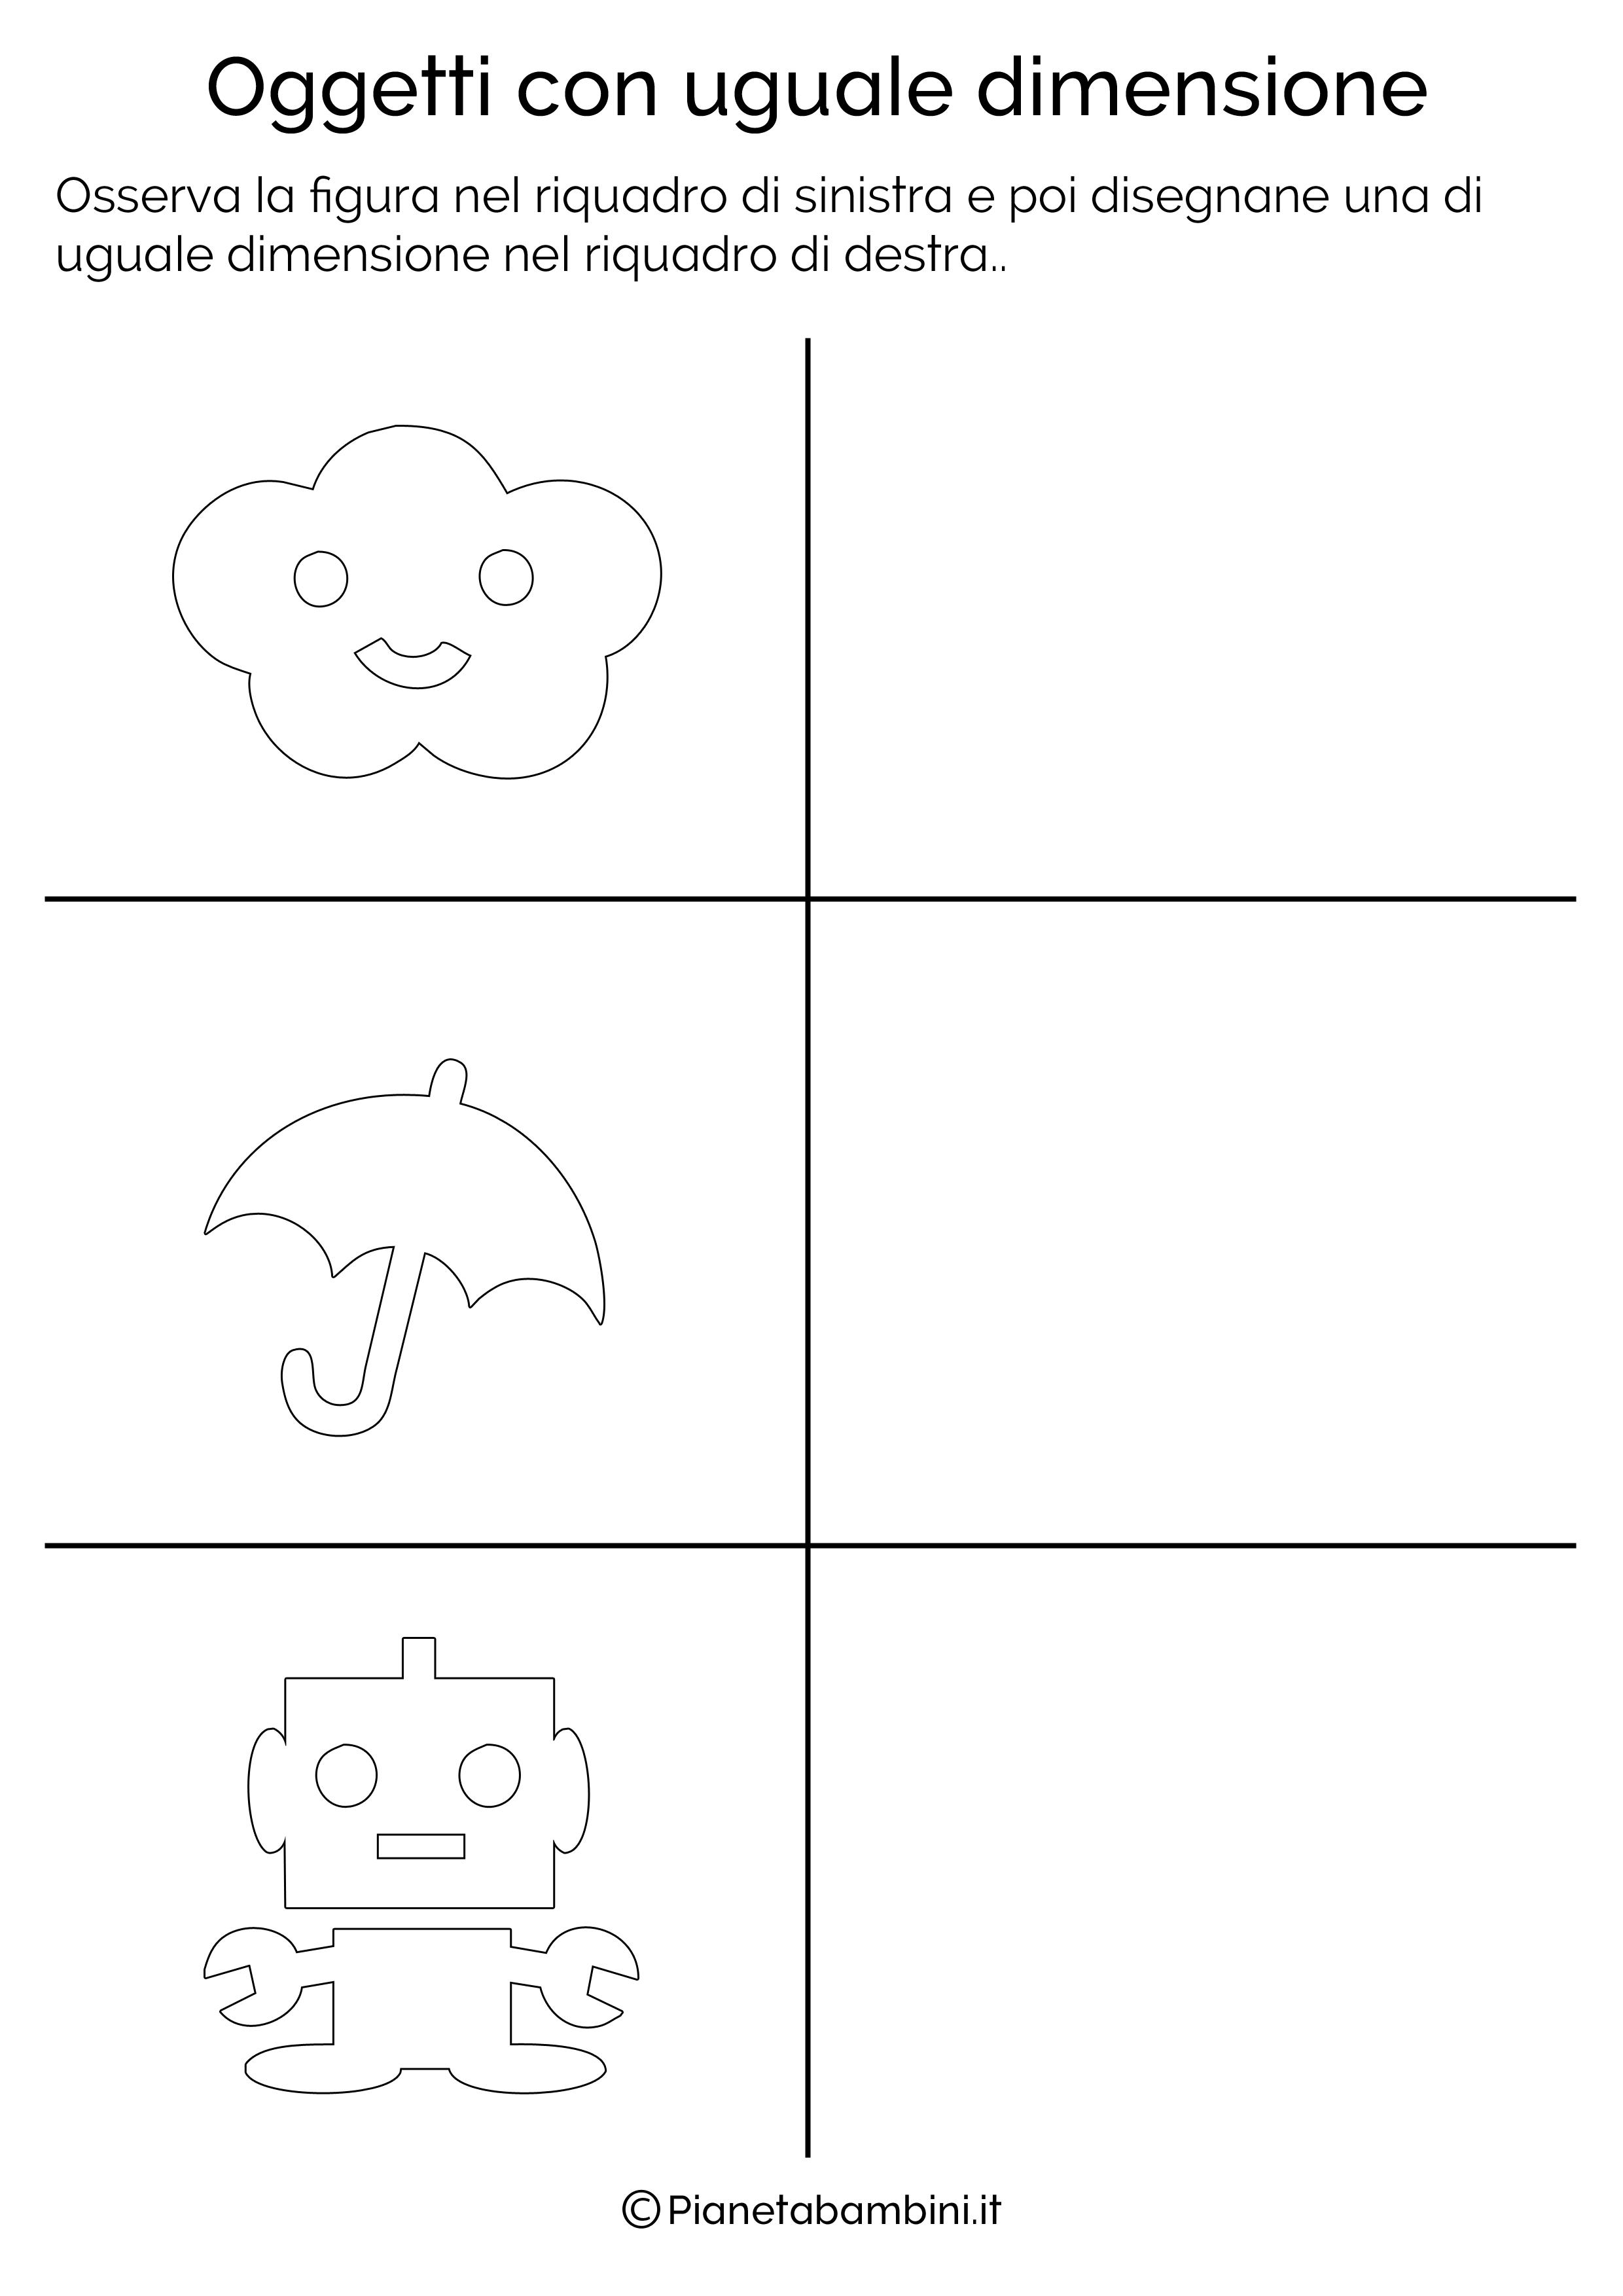 Esercizi-Oggetti-Uguale-Dimensione-3